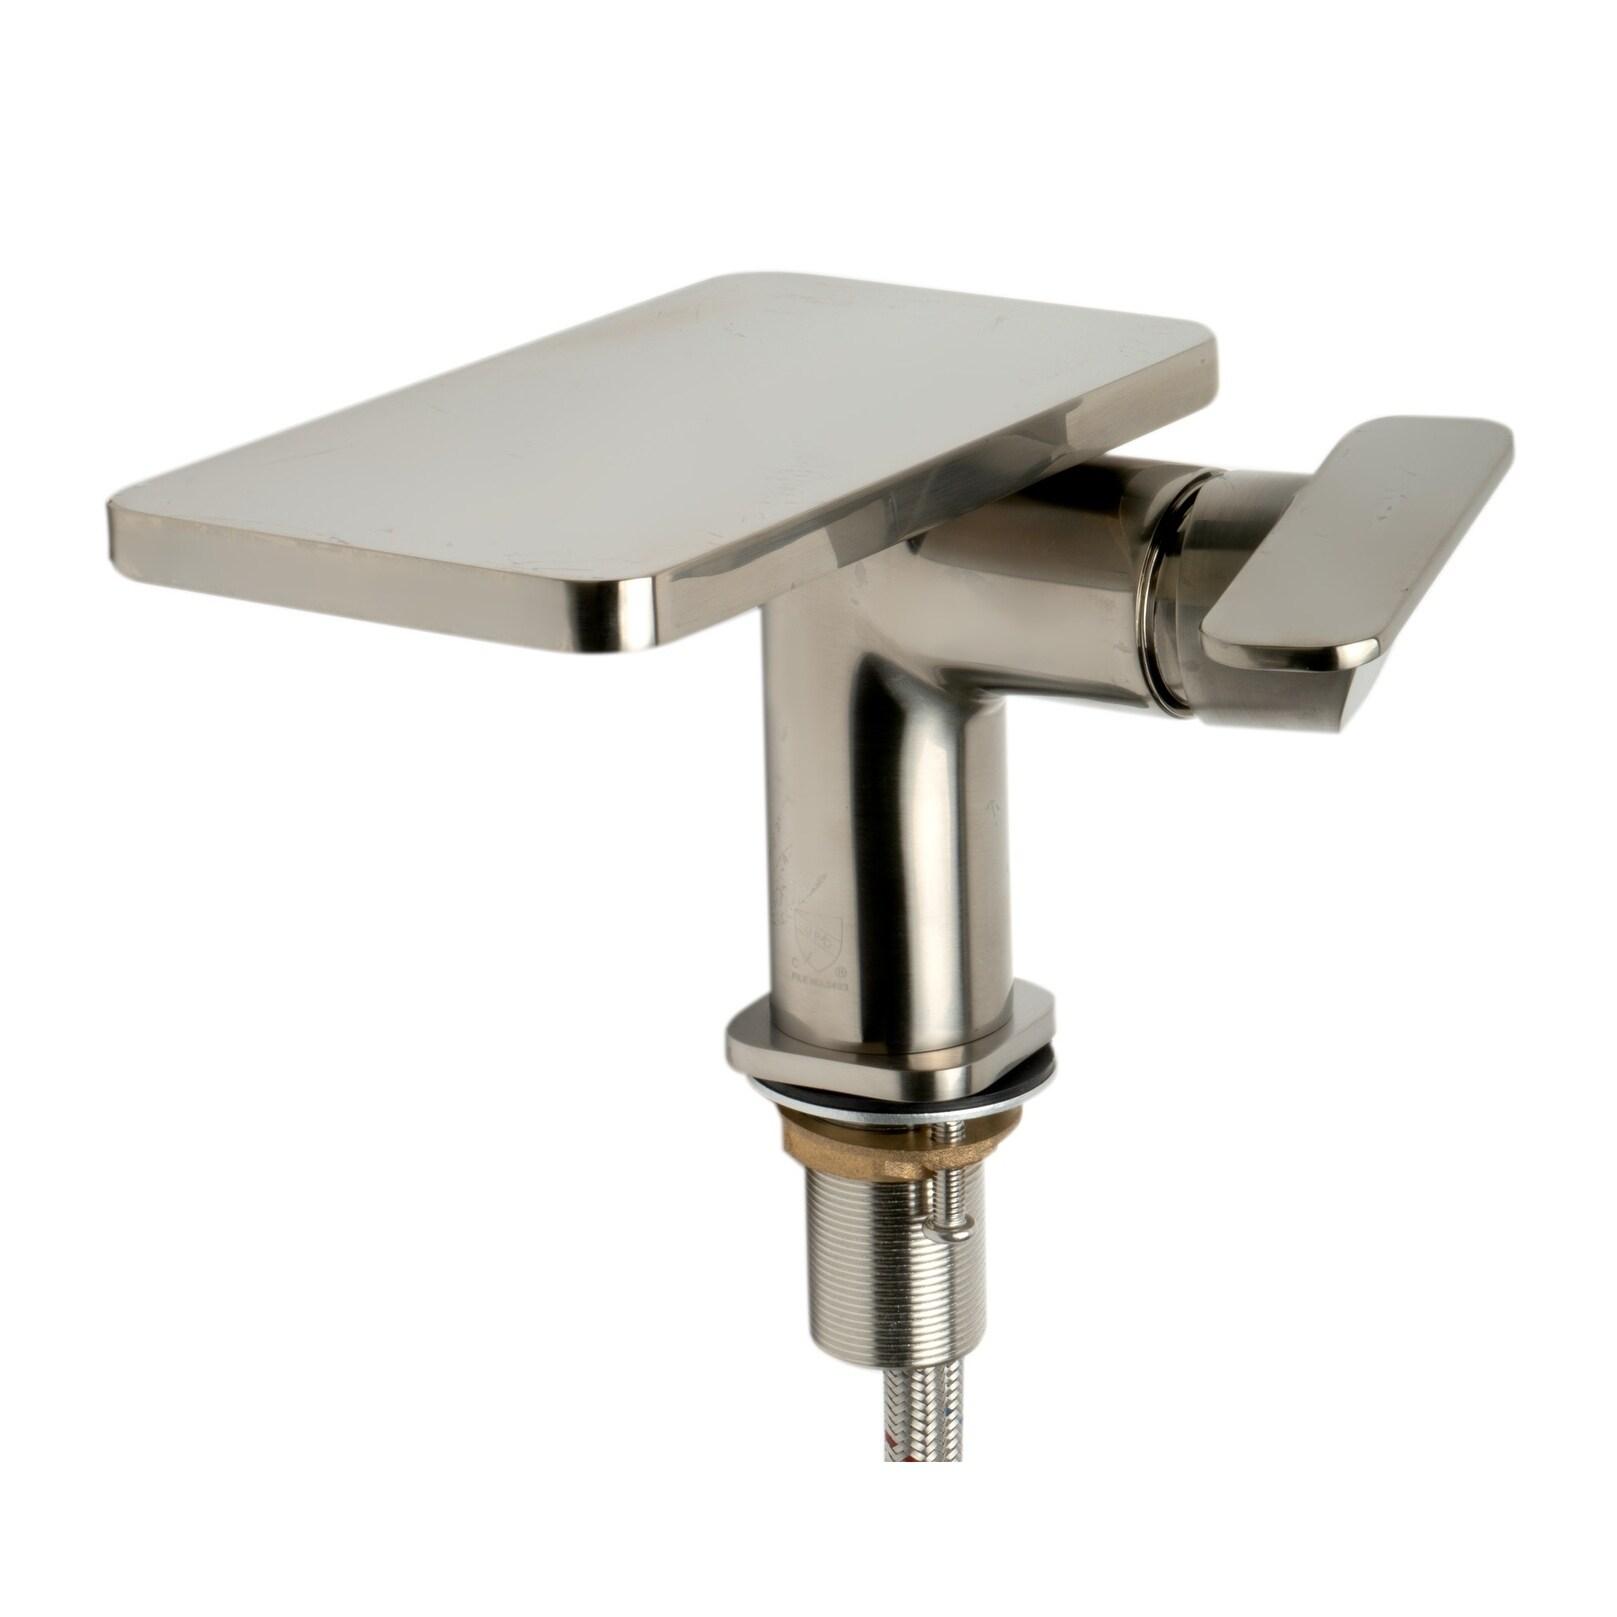 ALFI Brand Brushed Nickel Single-lever Bathroom Faucet